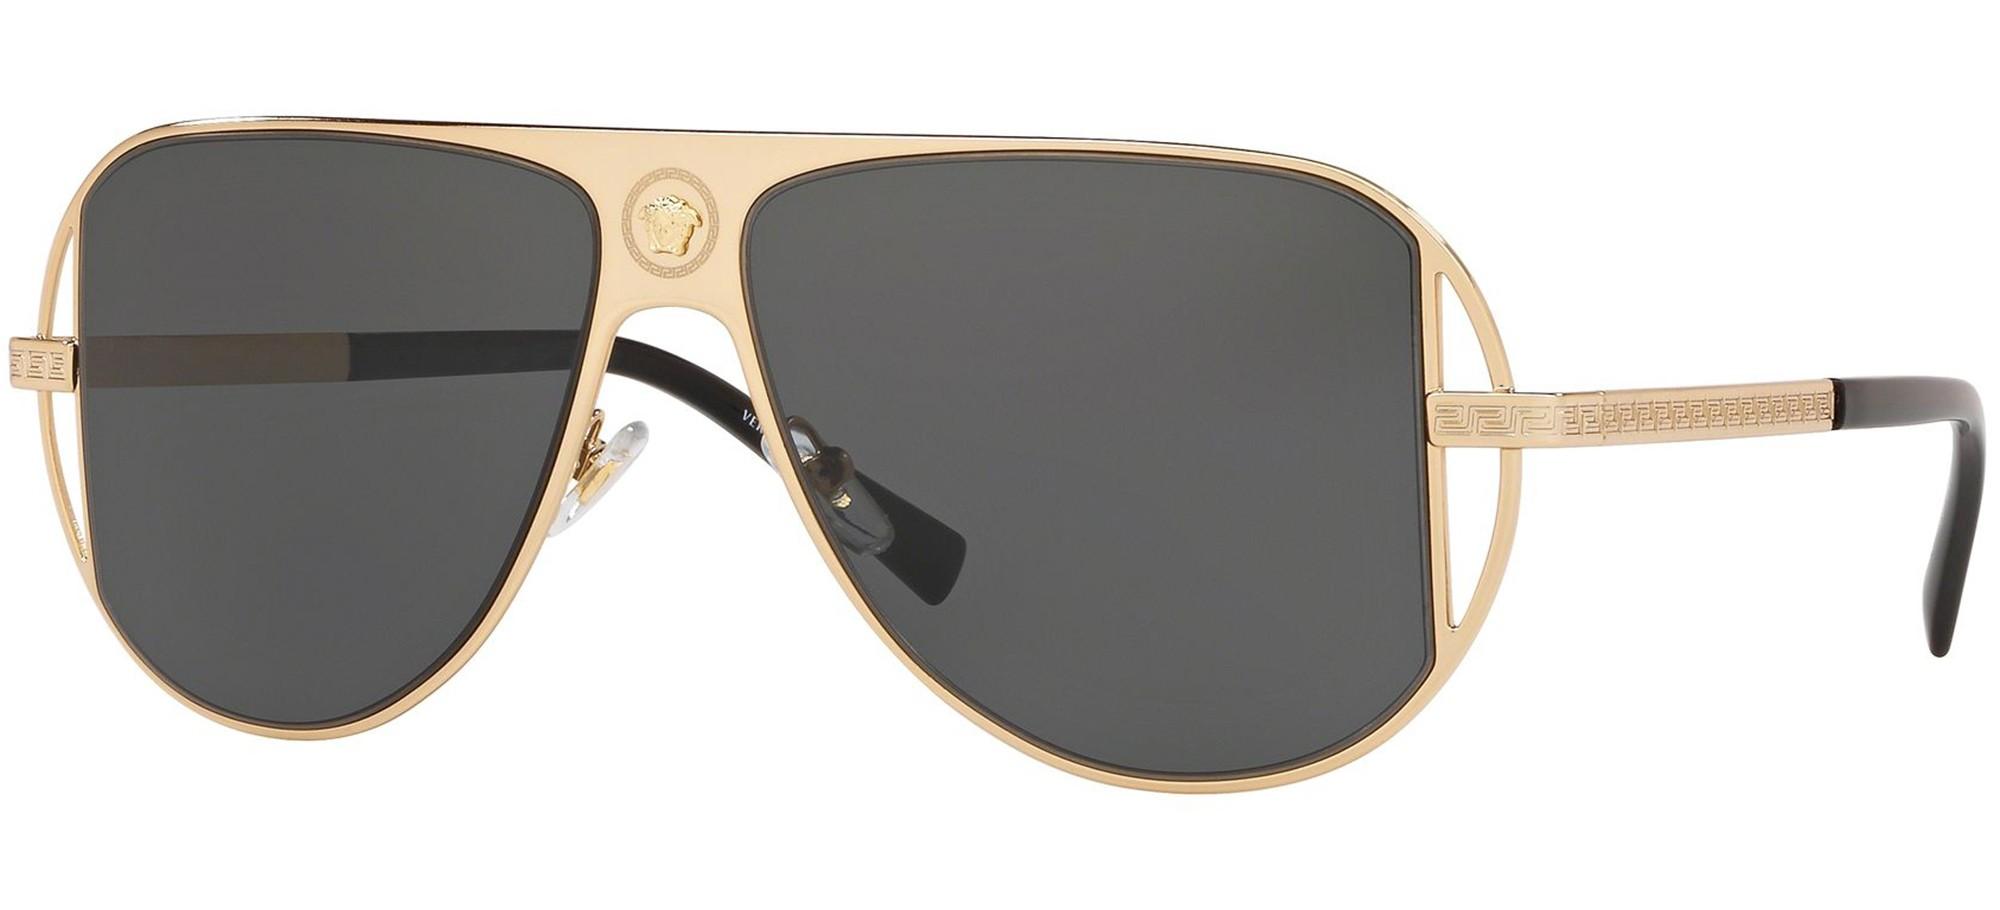 Versace sunglasses GRECMANIA VE 2212